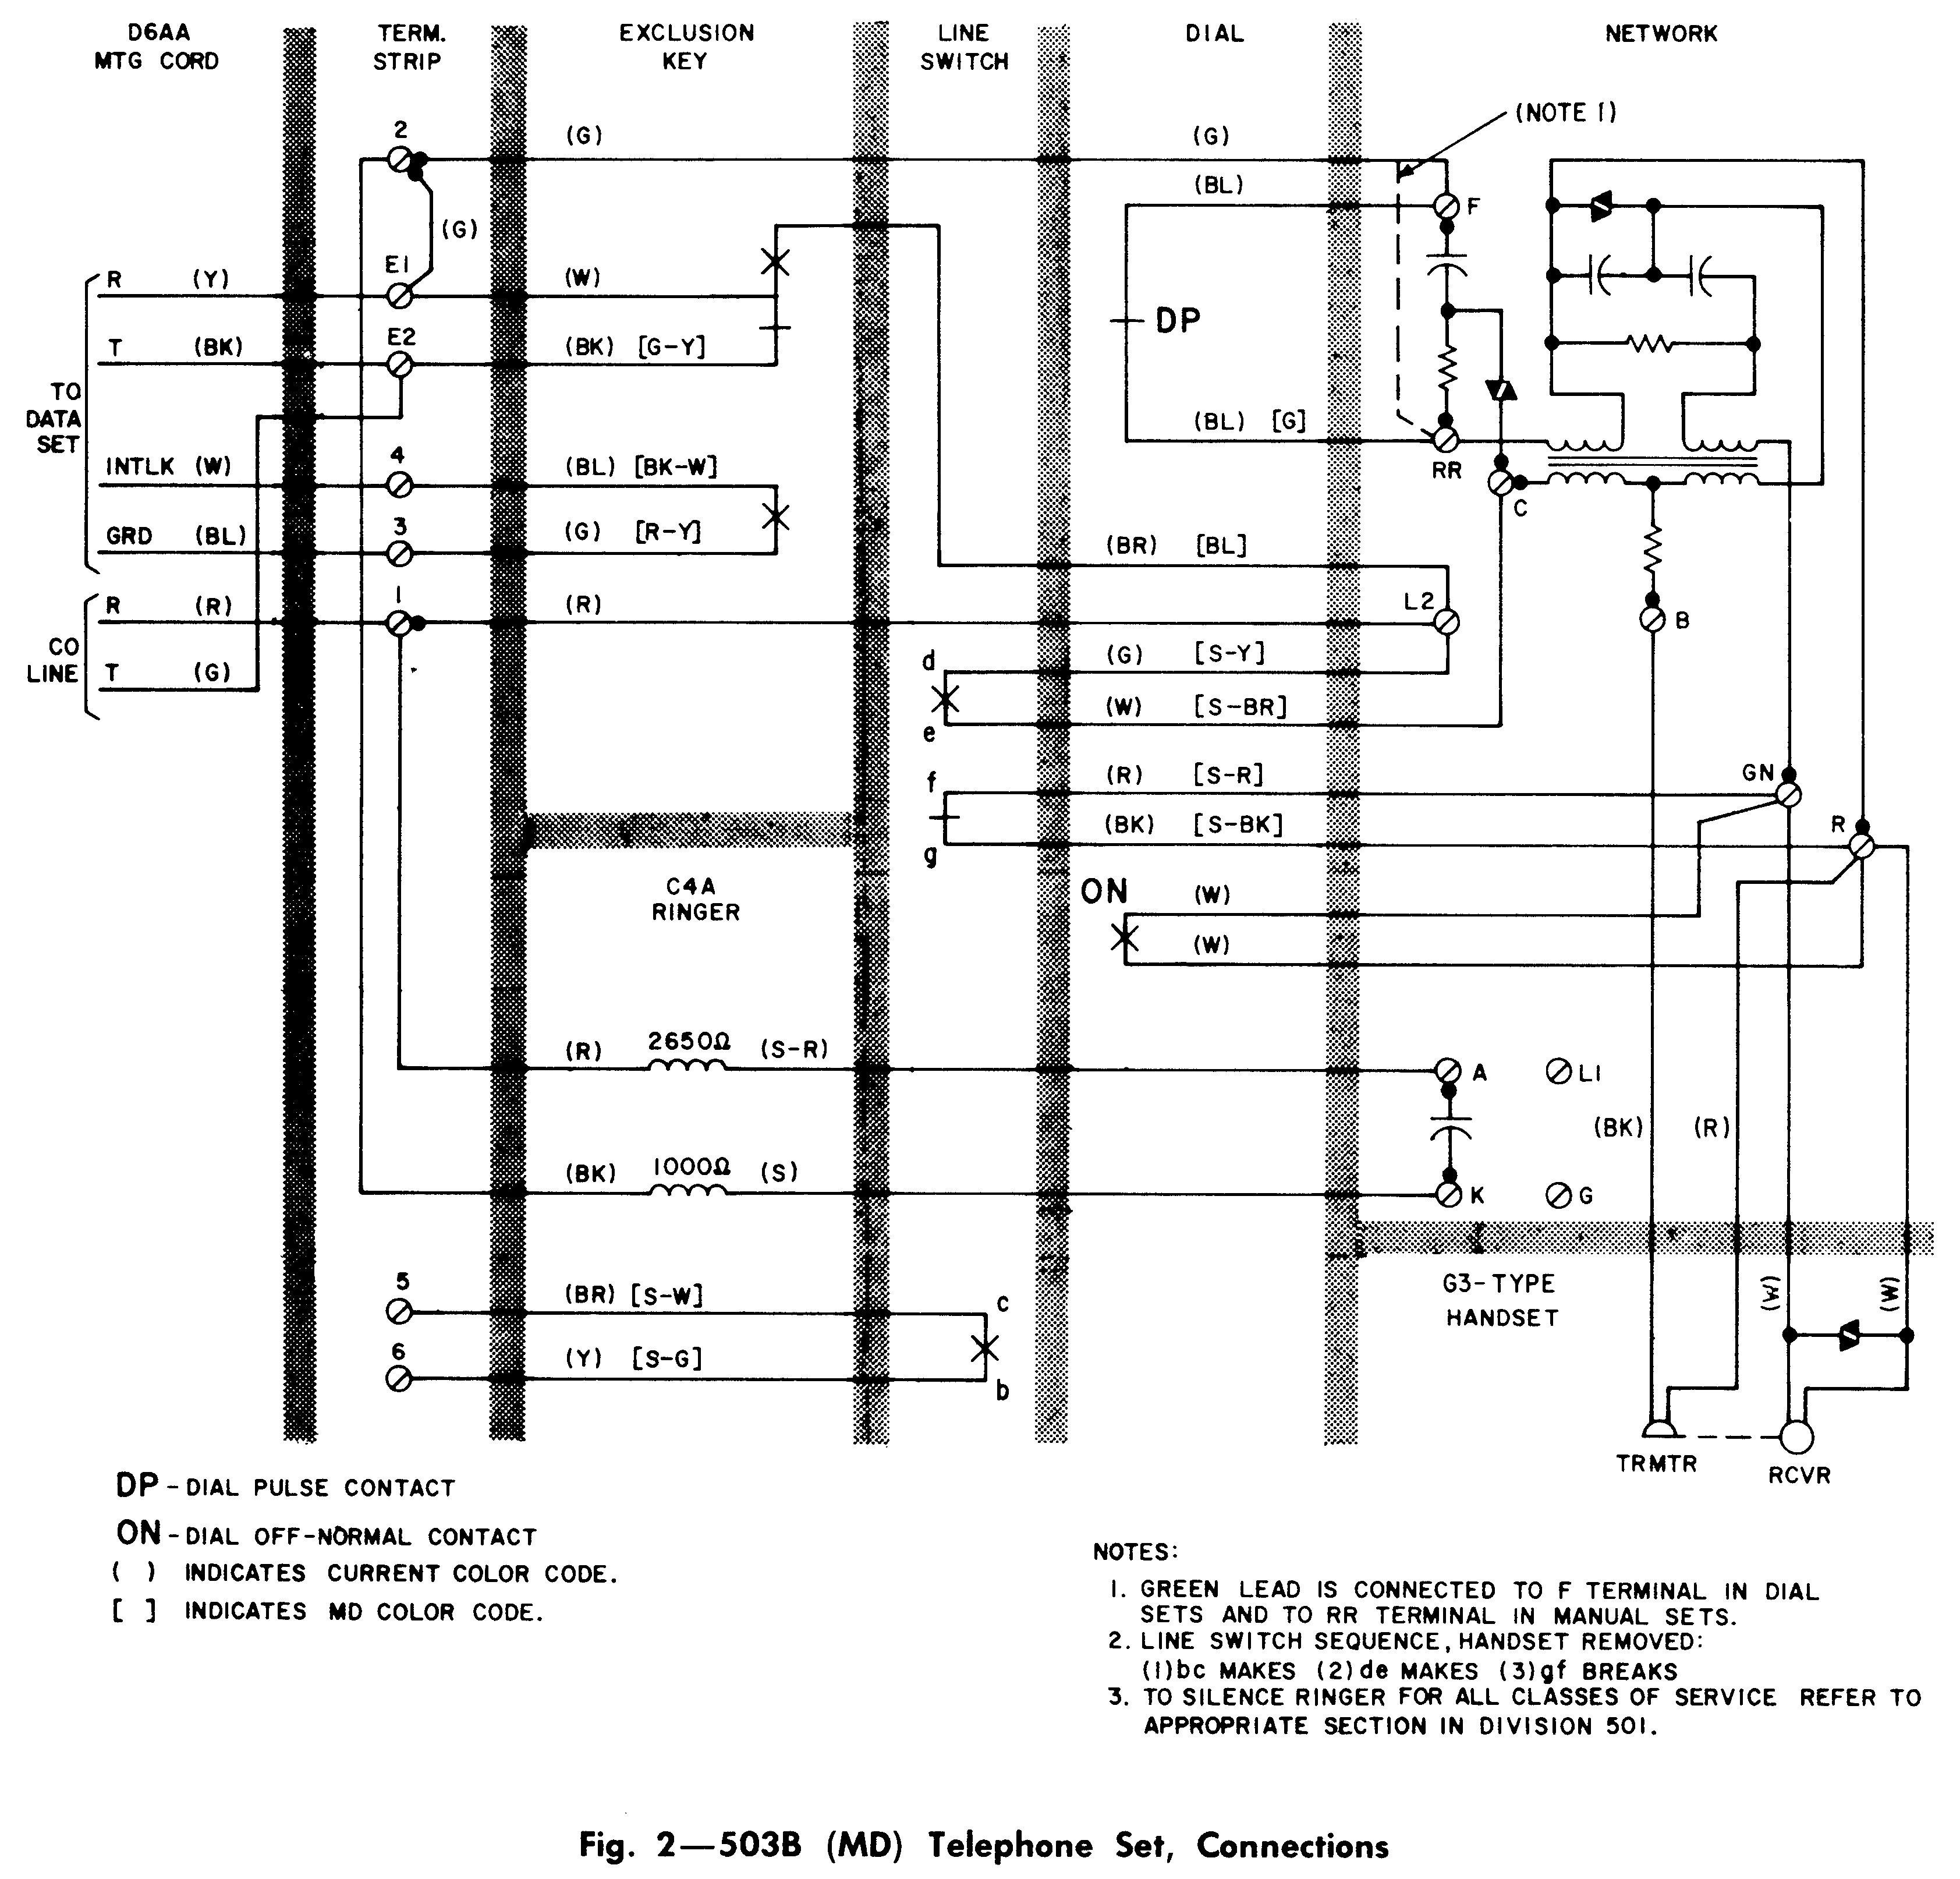 At Amp T Telephone Box Wiring Diagram | Manual E-Books - Telephone Wiring Diagram Outside Box